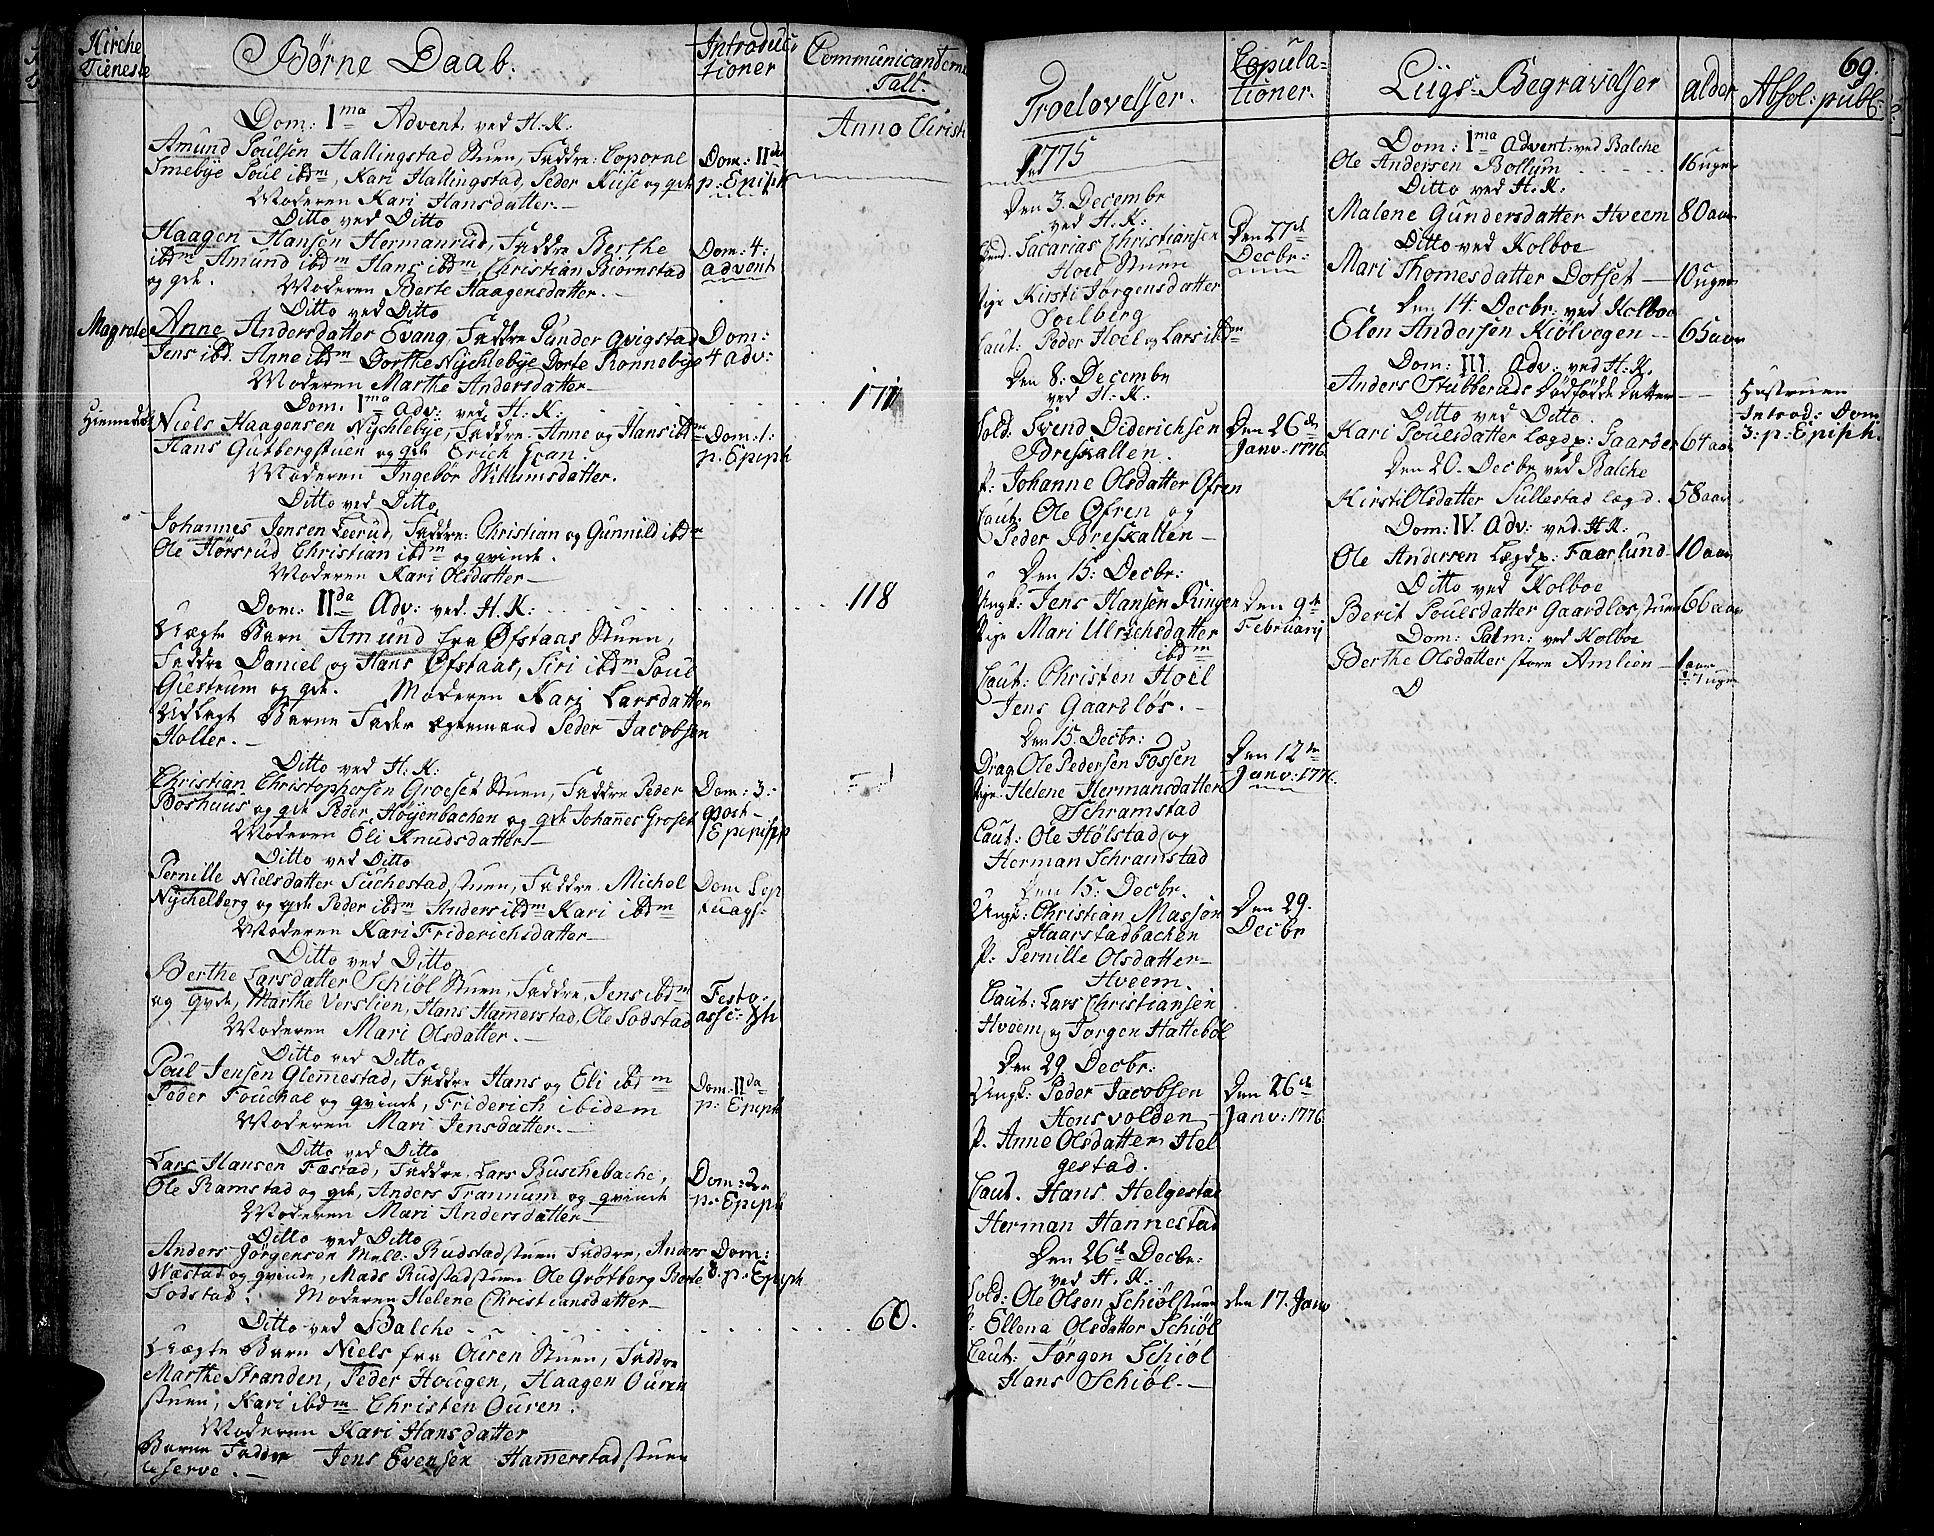 SAH, Toten prestekontor, Ministerialbok nr. 6, 1773-1793, s. 69